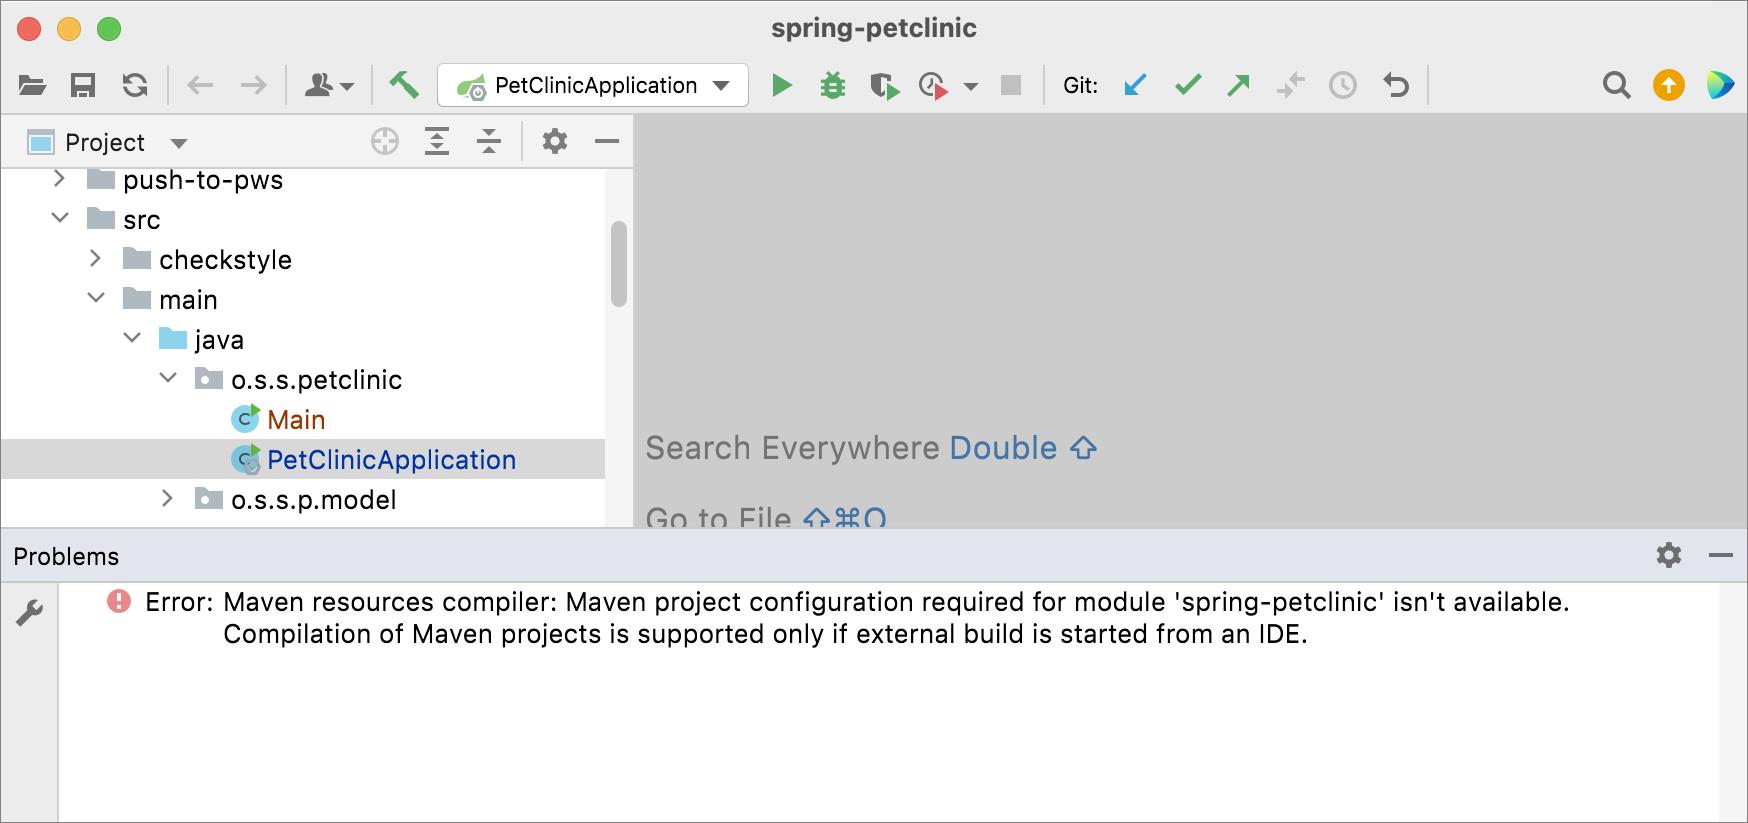 Problems tool window